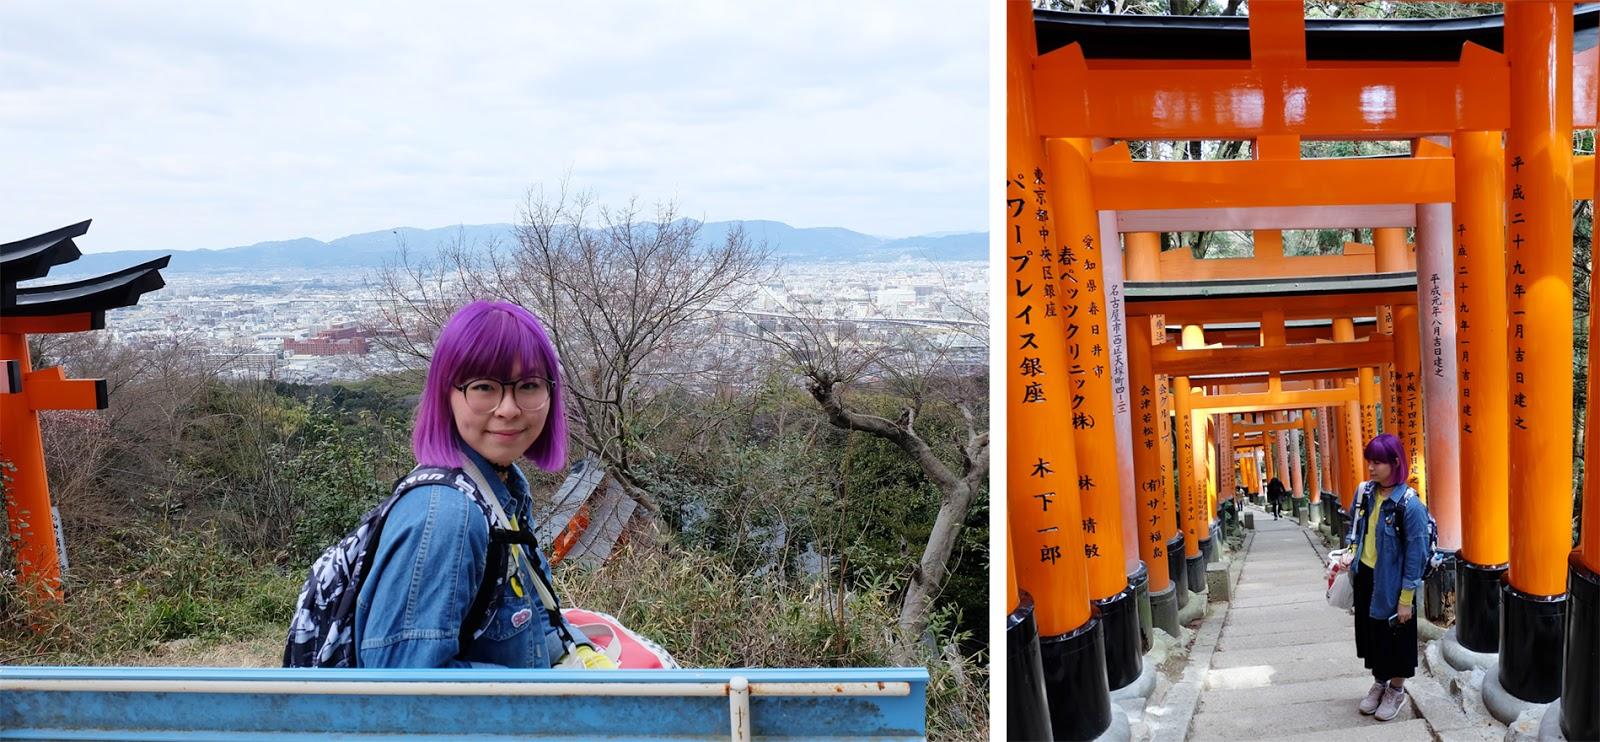 Japan 14 days itinerary kyoto fushimi inari | www.bigdreamerblog.com